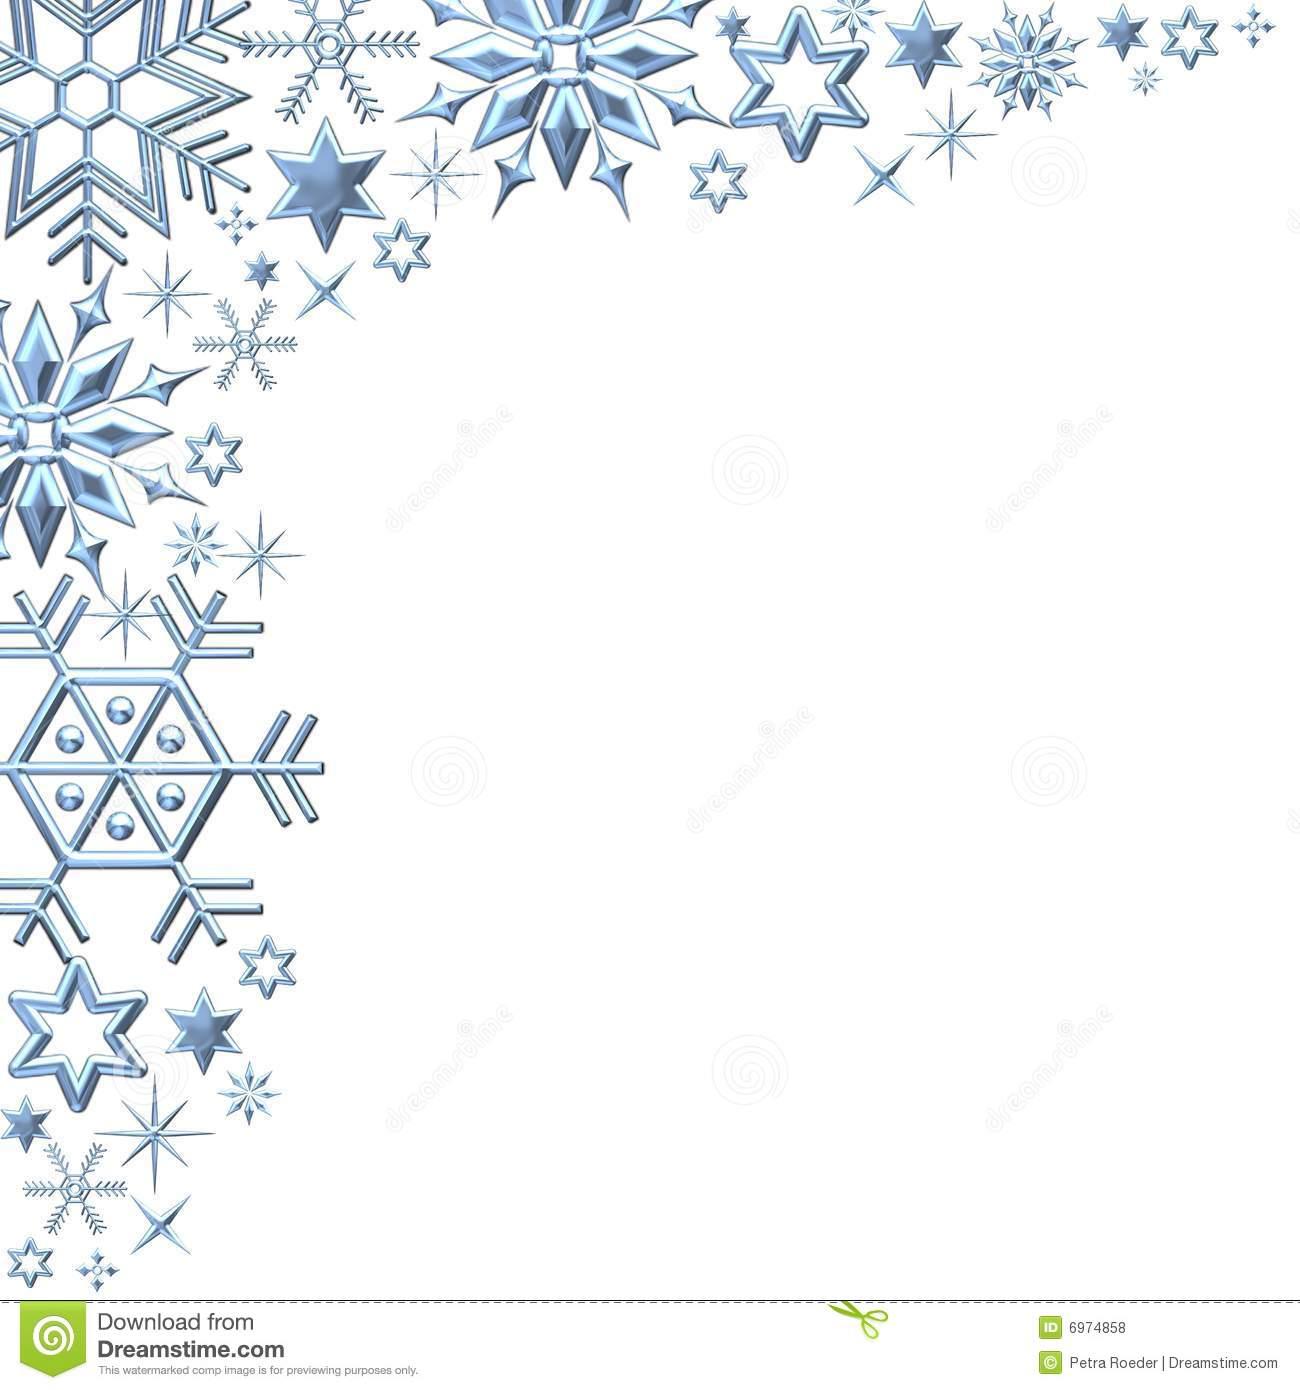 December clipart borders svg stock 37+ Winter Clip Art Borders | ClipartLook svg stock